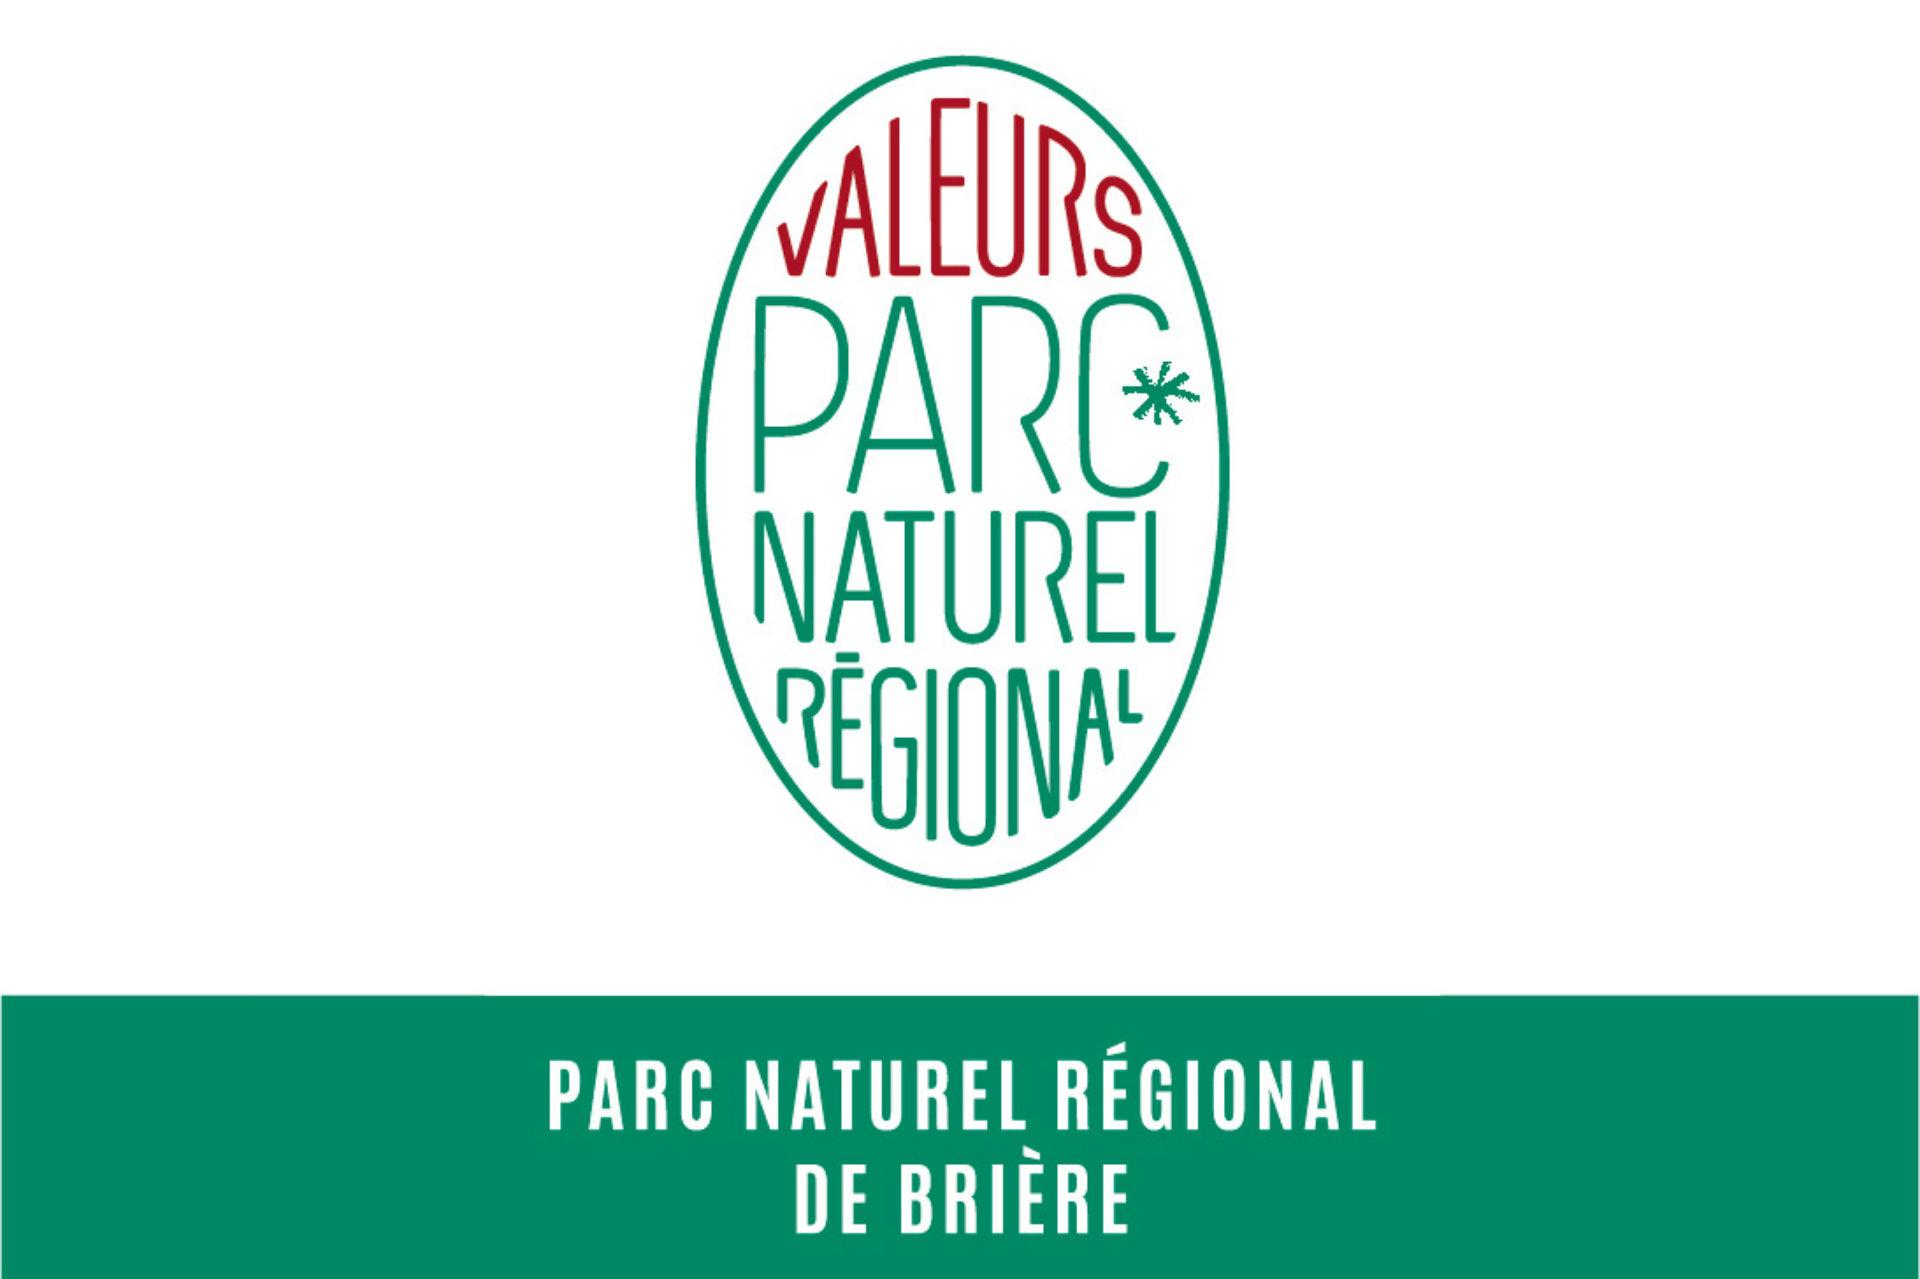 Logo marque Valeurs PNR